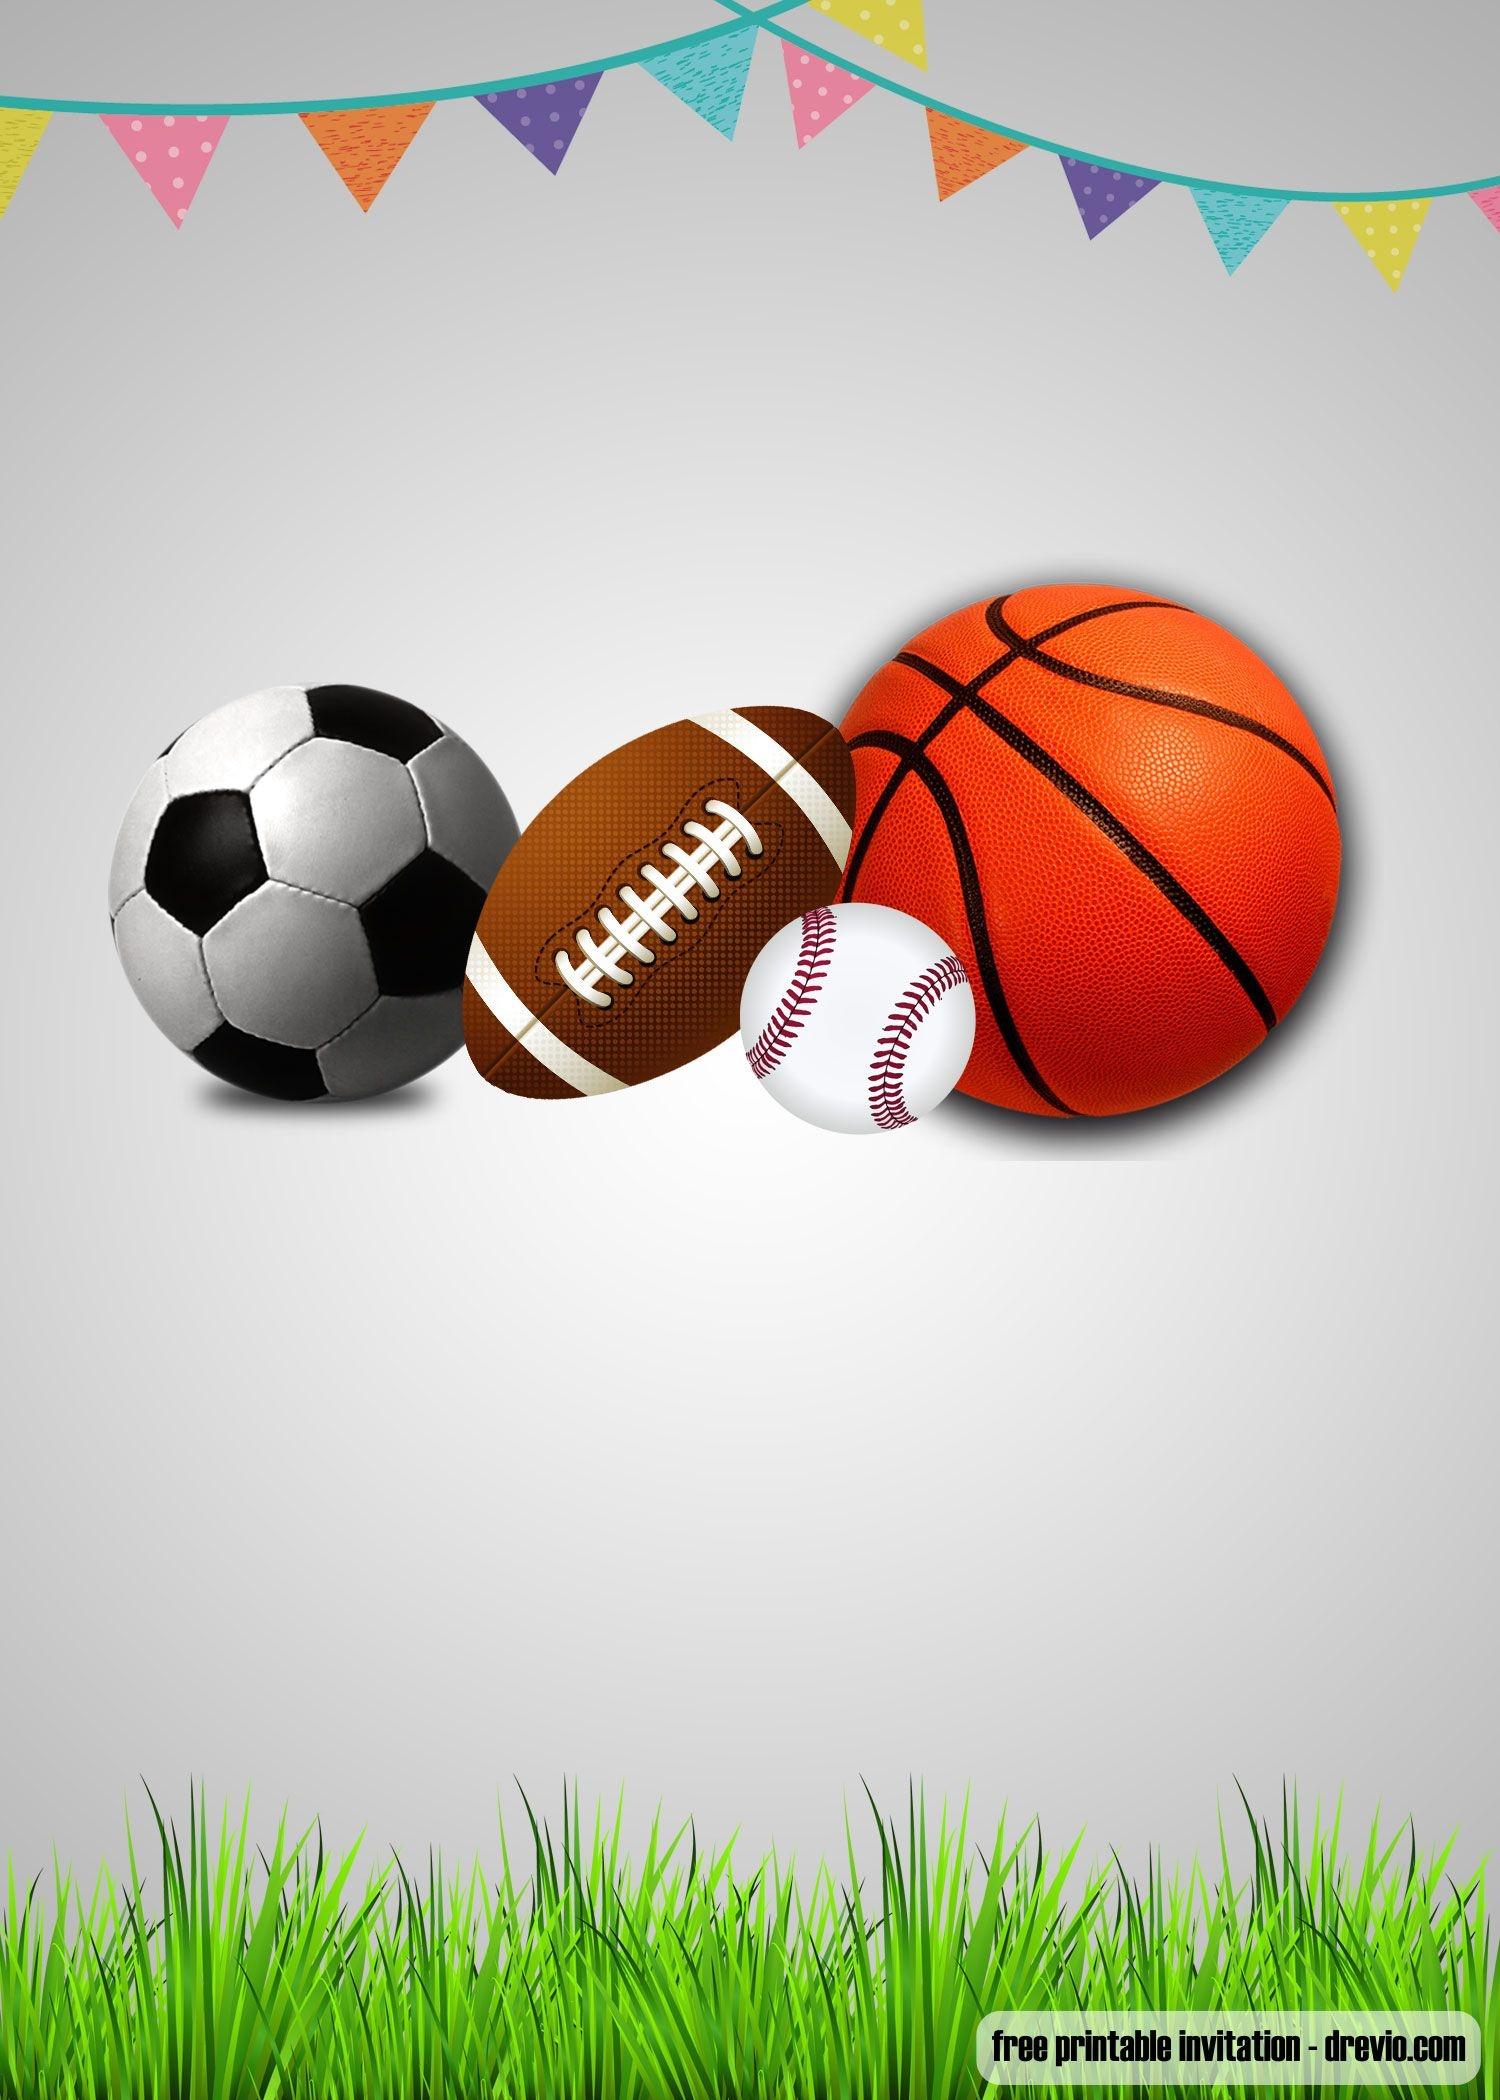 Free Printable Sports-Themed Birthday Invitation Templates - Free Printable Sports Birthday Invitation Templates